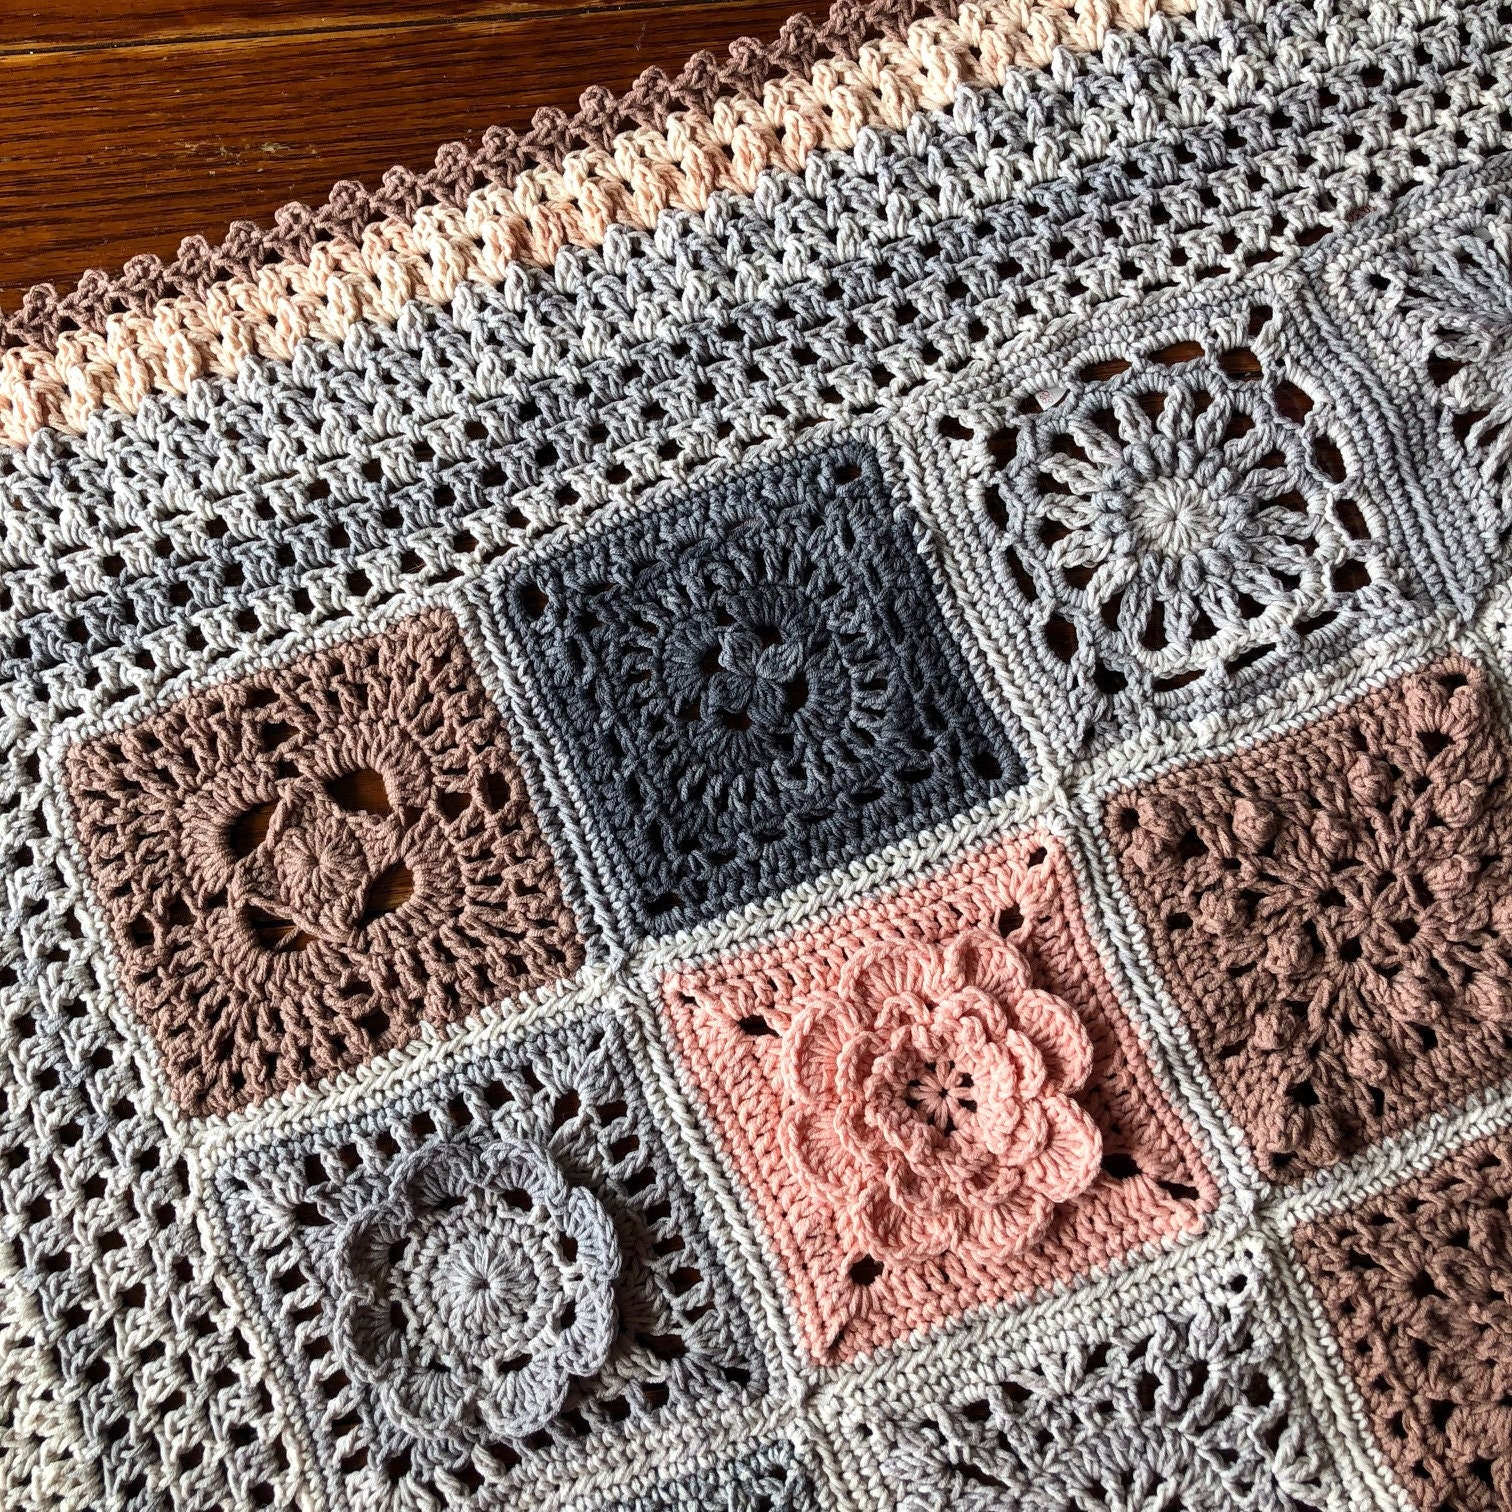 Crochet Blanket Patterns Crochet Baby Blanket Wedding Gift Crochet Blanket Crochet Granny Square Easy Crochet Pattern Easy Blanket Pattern